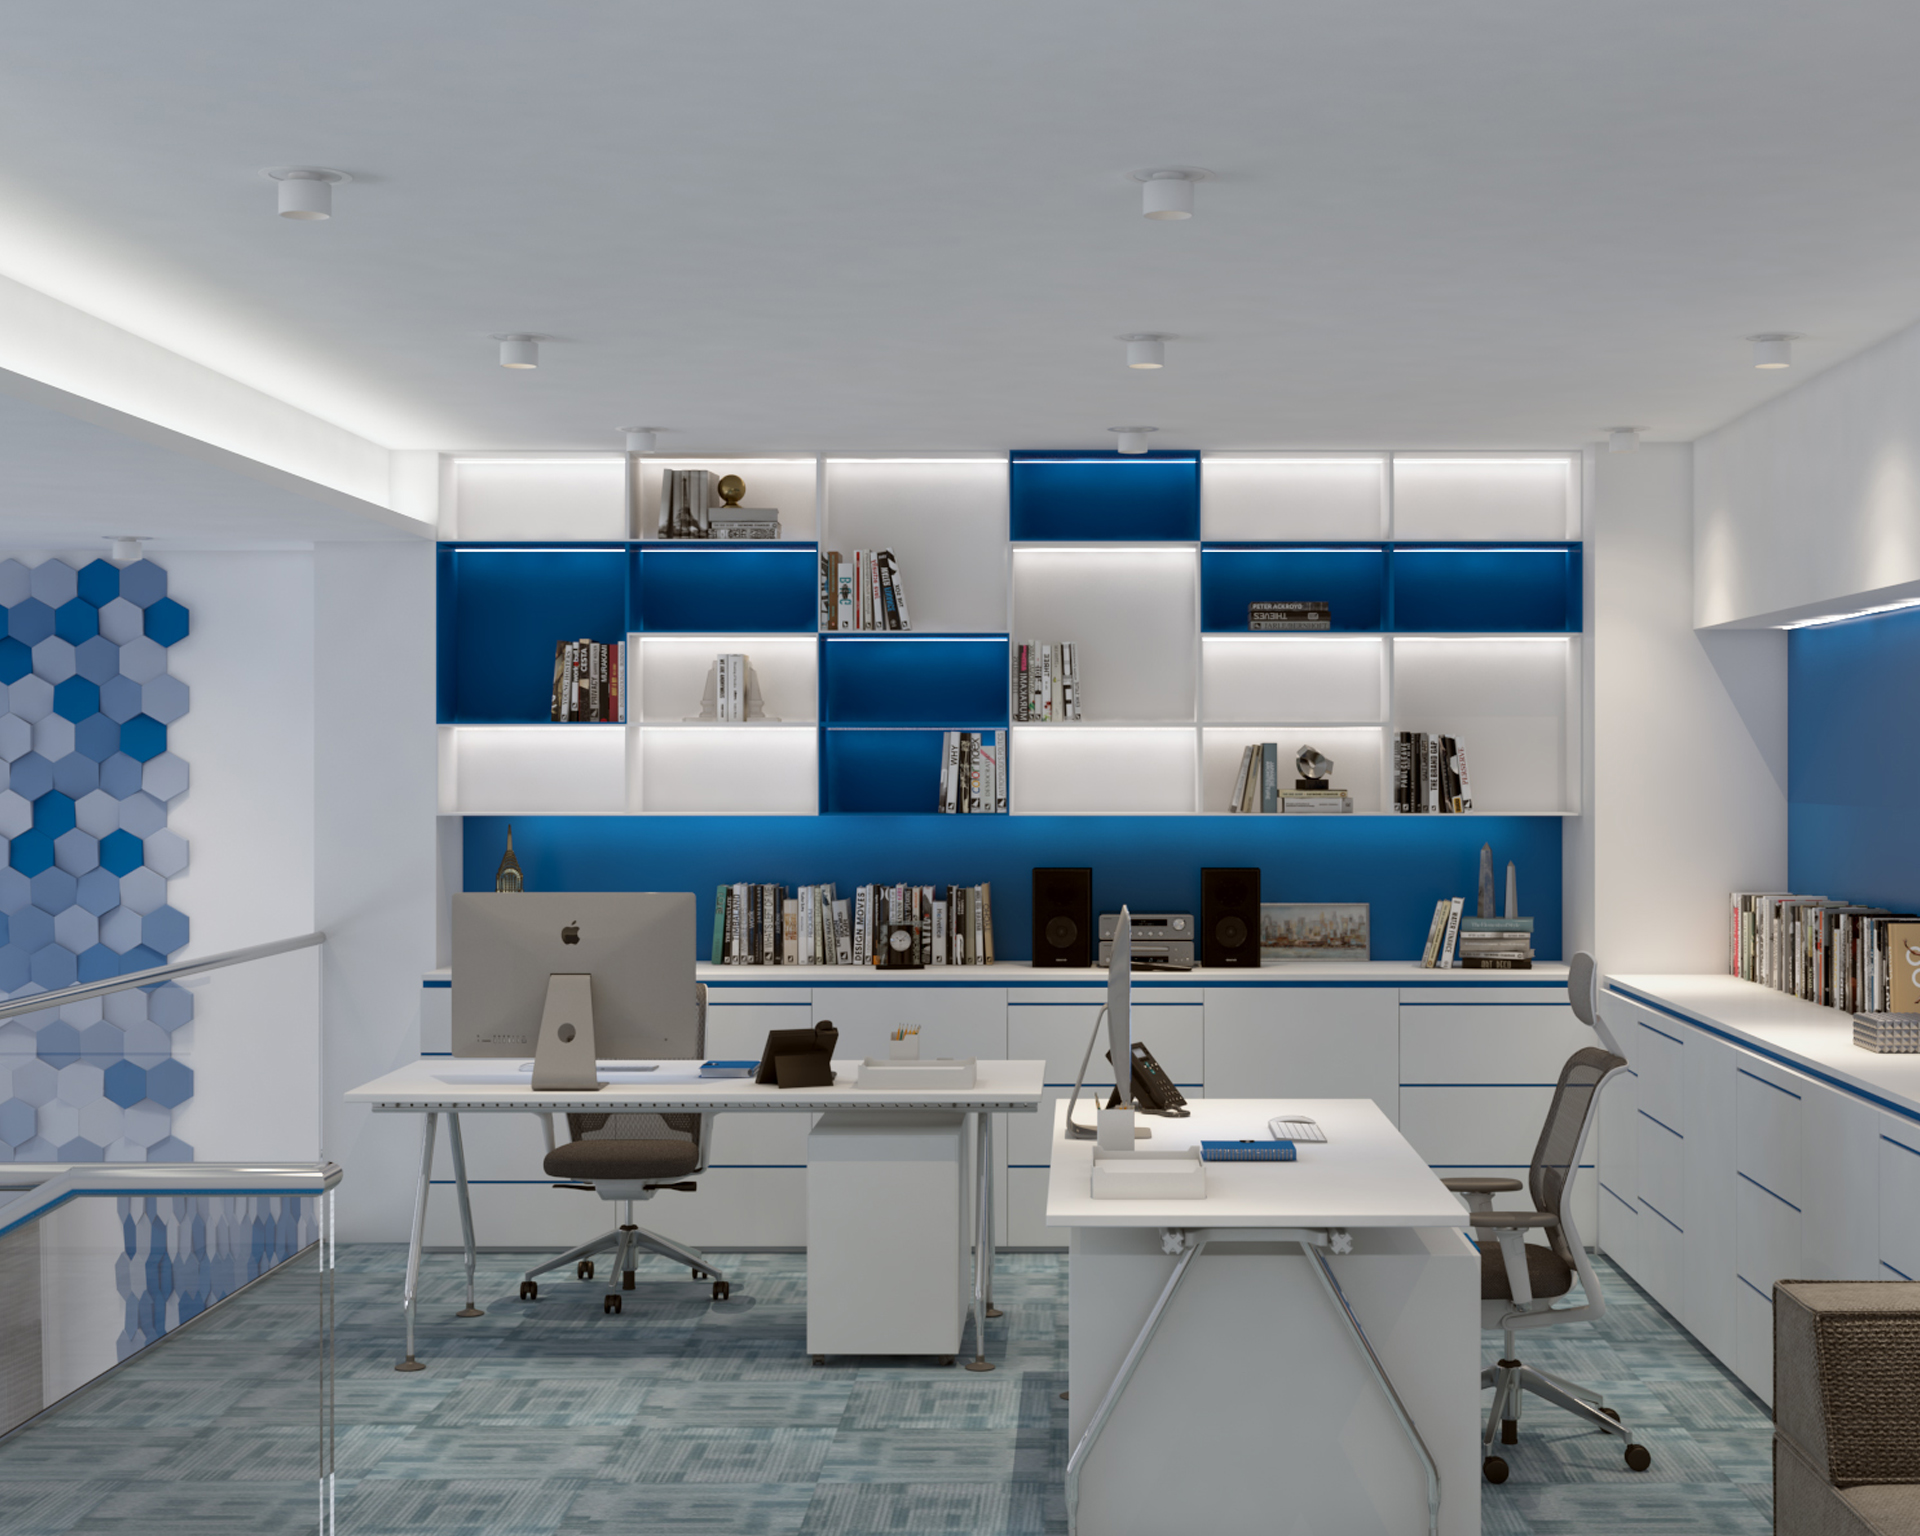 oficinas-madrid-alfonso-perez-alvarez